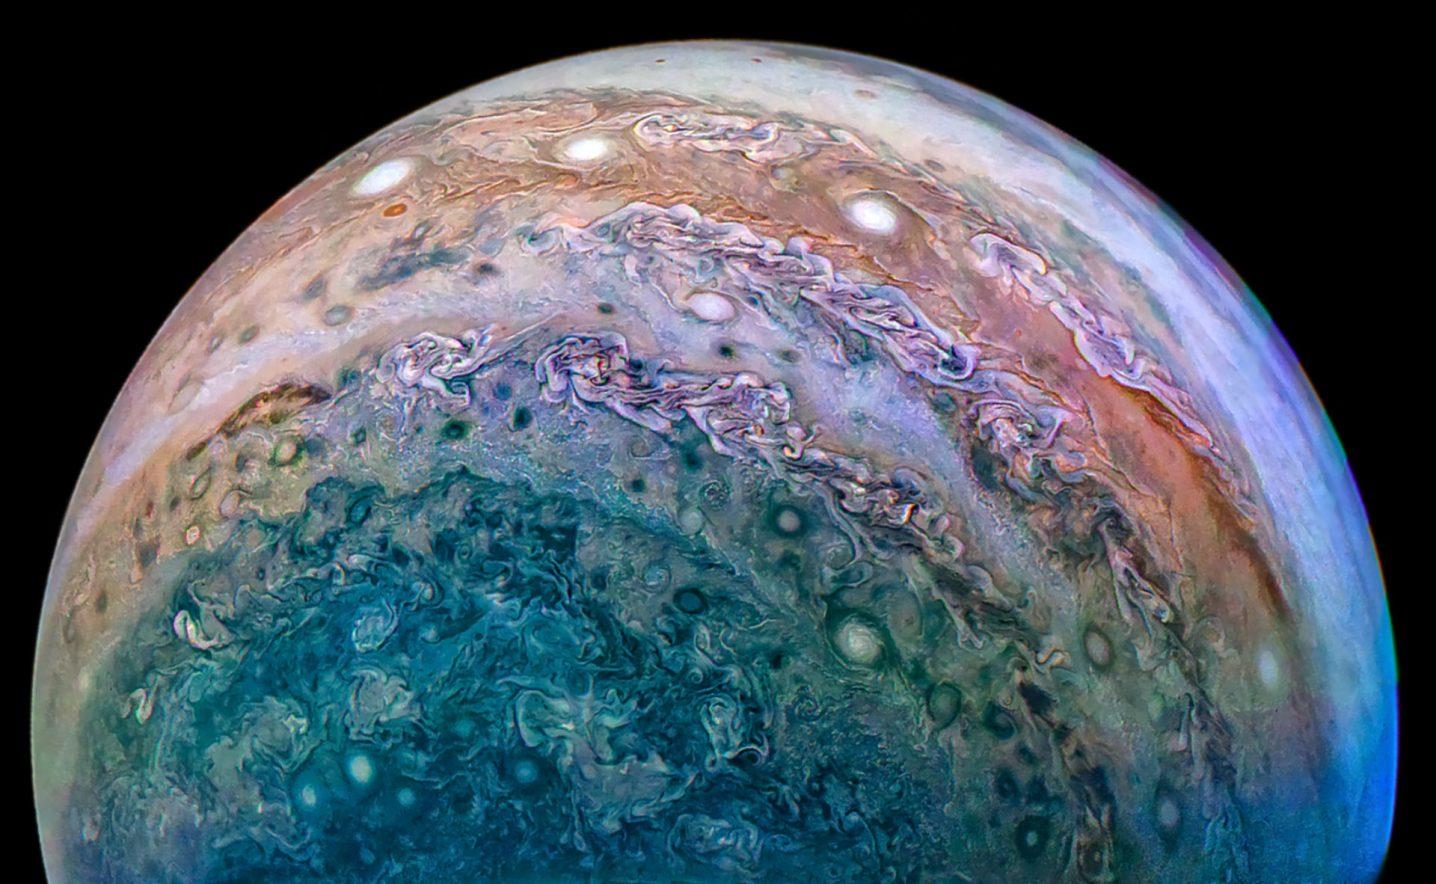 image_5608_2e-Jupiter